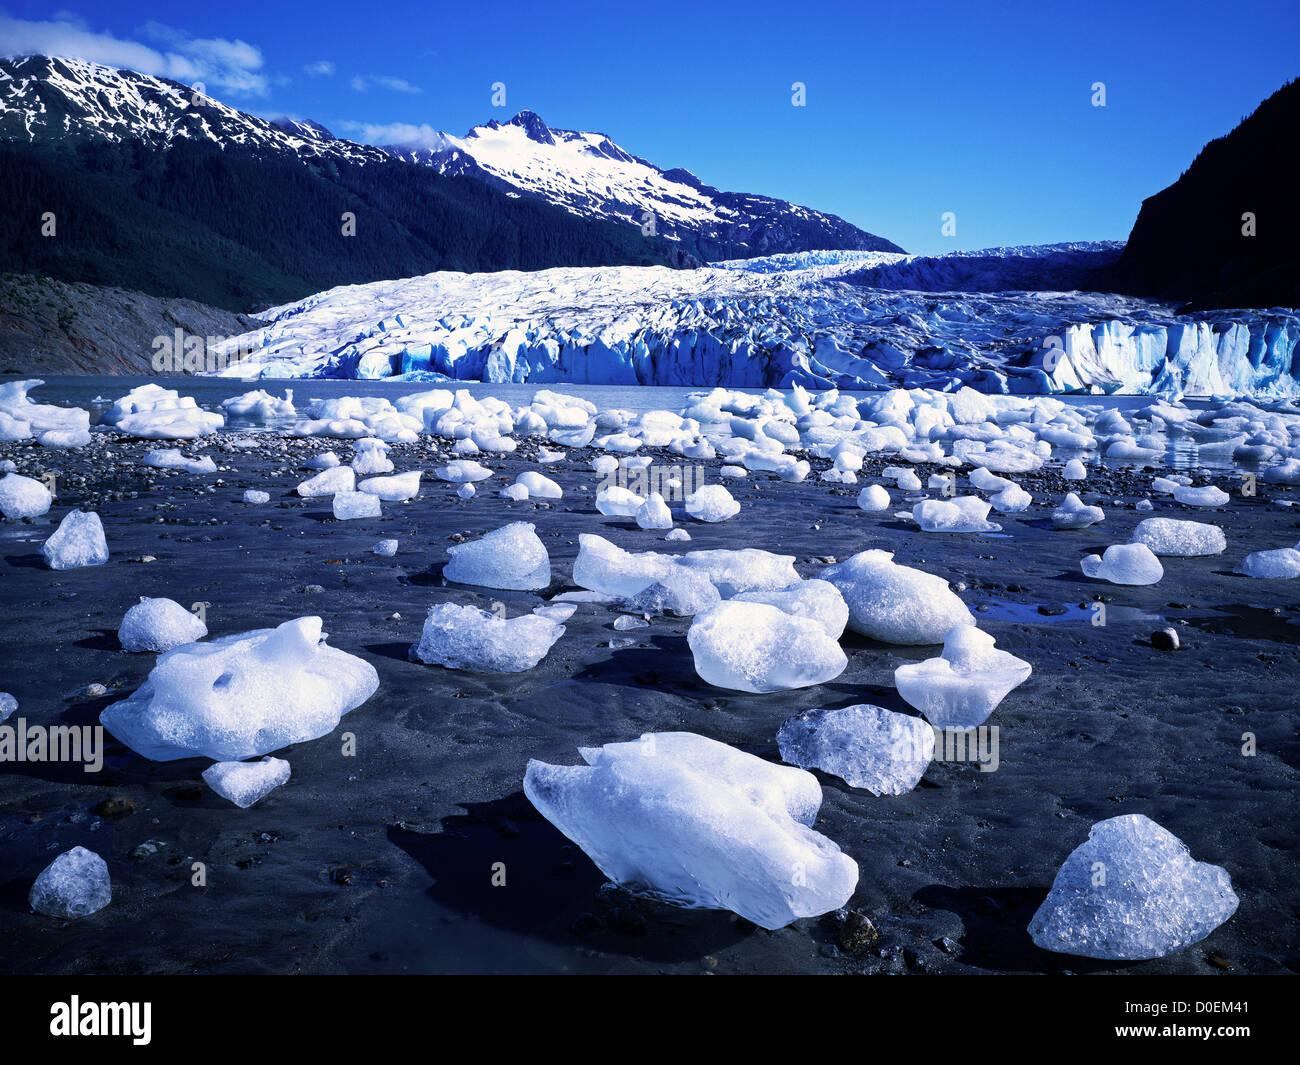 Icebergs Along the Shore of Mendenhall Lake, Alaska - Stock Image